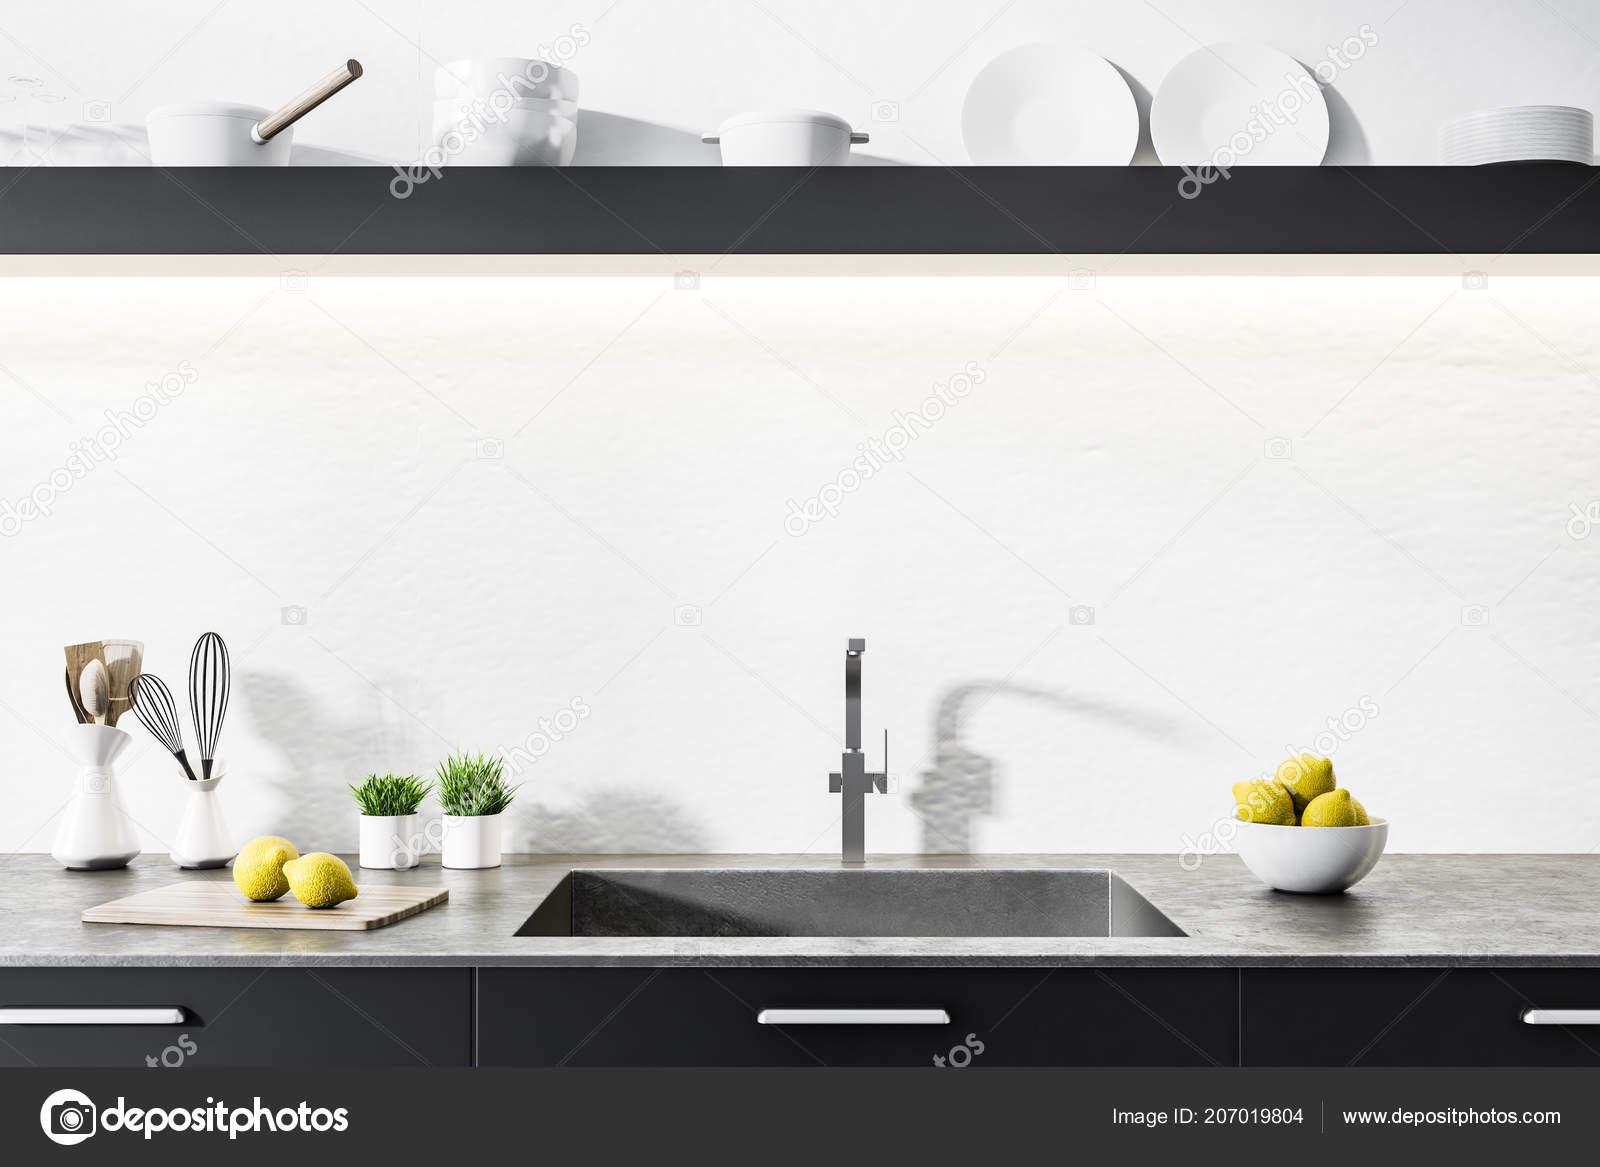 black kitchen sinks unique tables 黑色厨房台面与一个内置水槽和瓶子在一个白色的厨房内部上面挂着盘子的长 黑色厨房台面与一个内置水槽和瓶子在一个白色的厨房内部上面